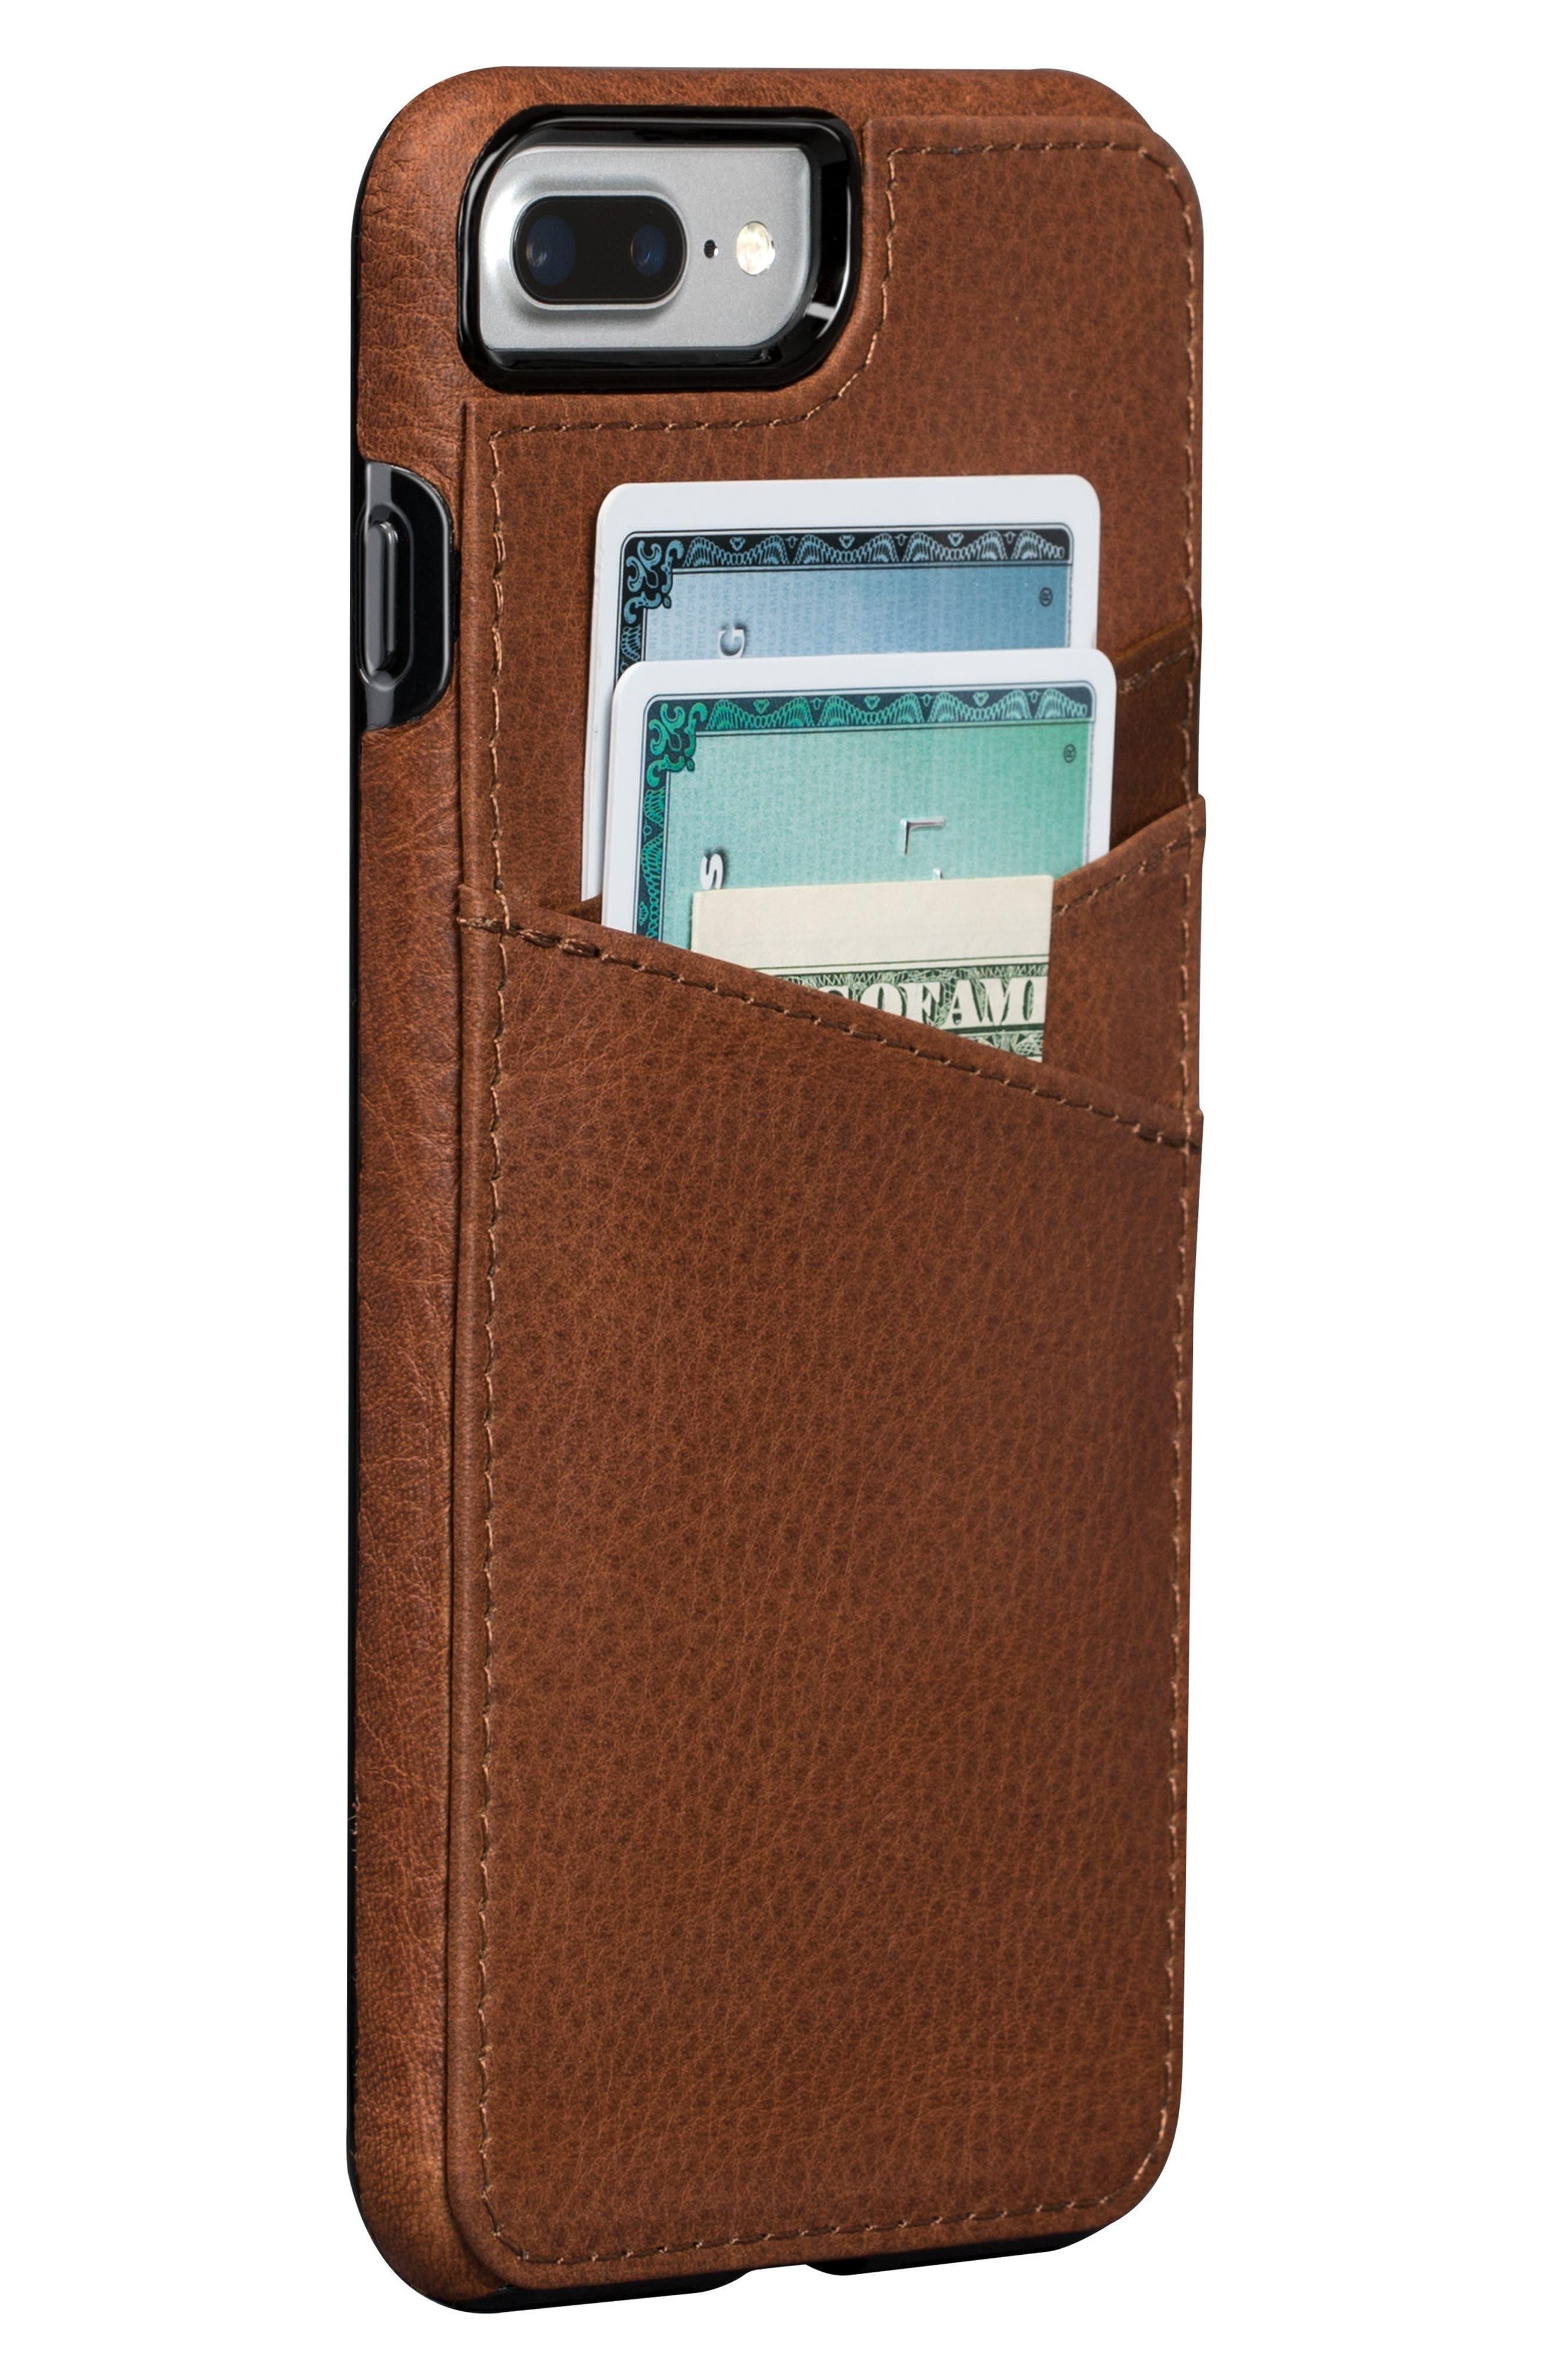 Bence Lugano iPhone 7/8 Plus Wallet Case,                             Main thumbnail 1, color,                             SADDLE